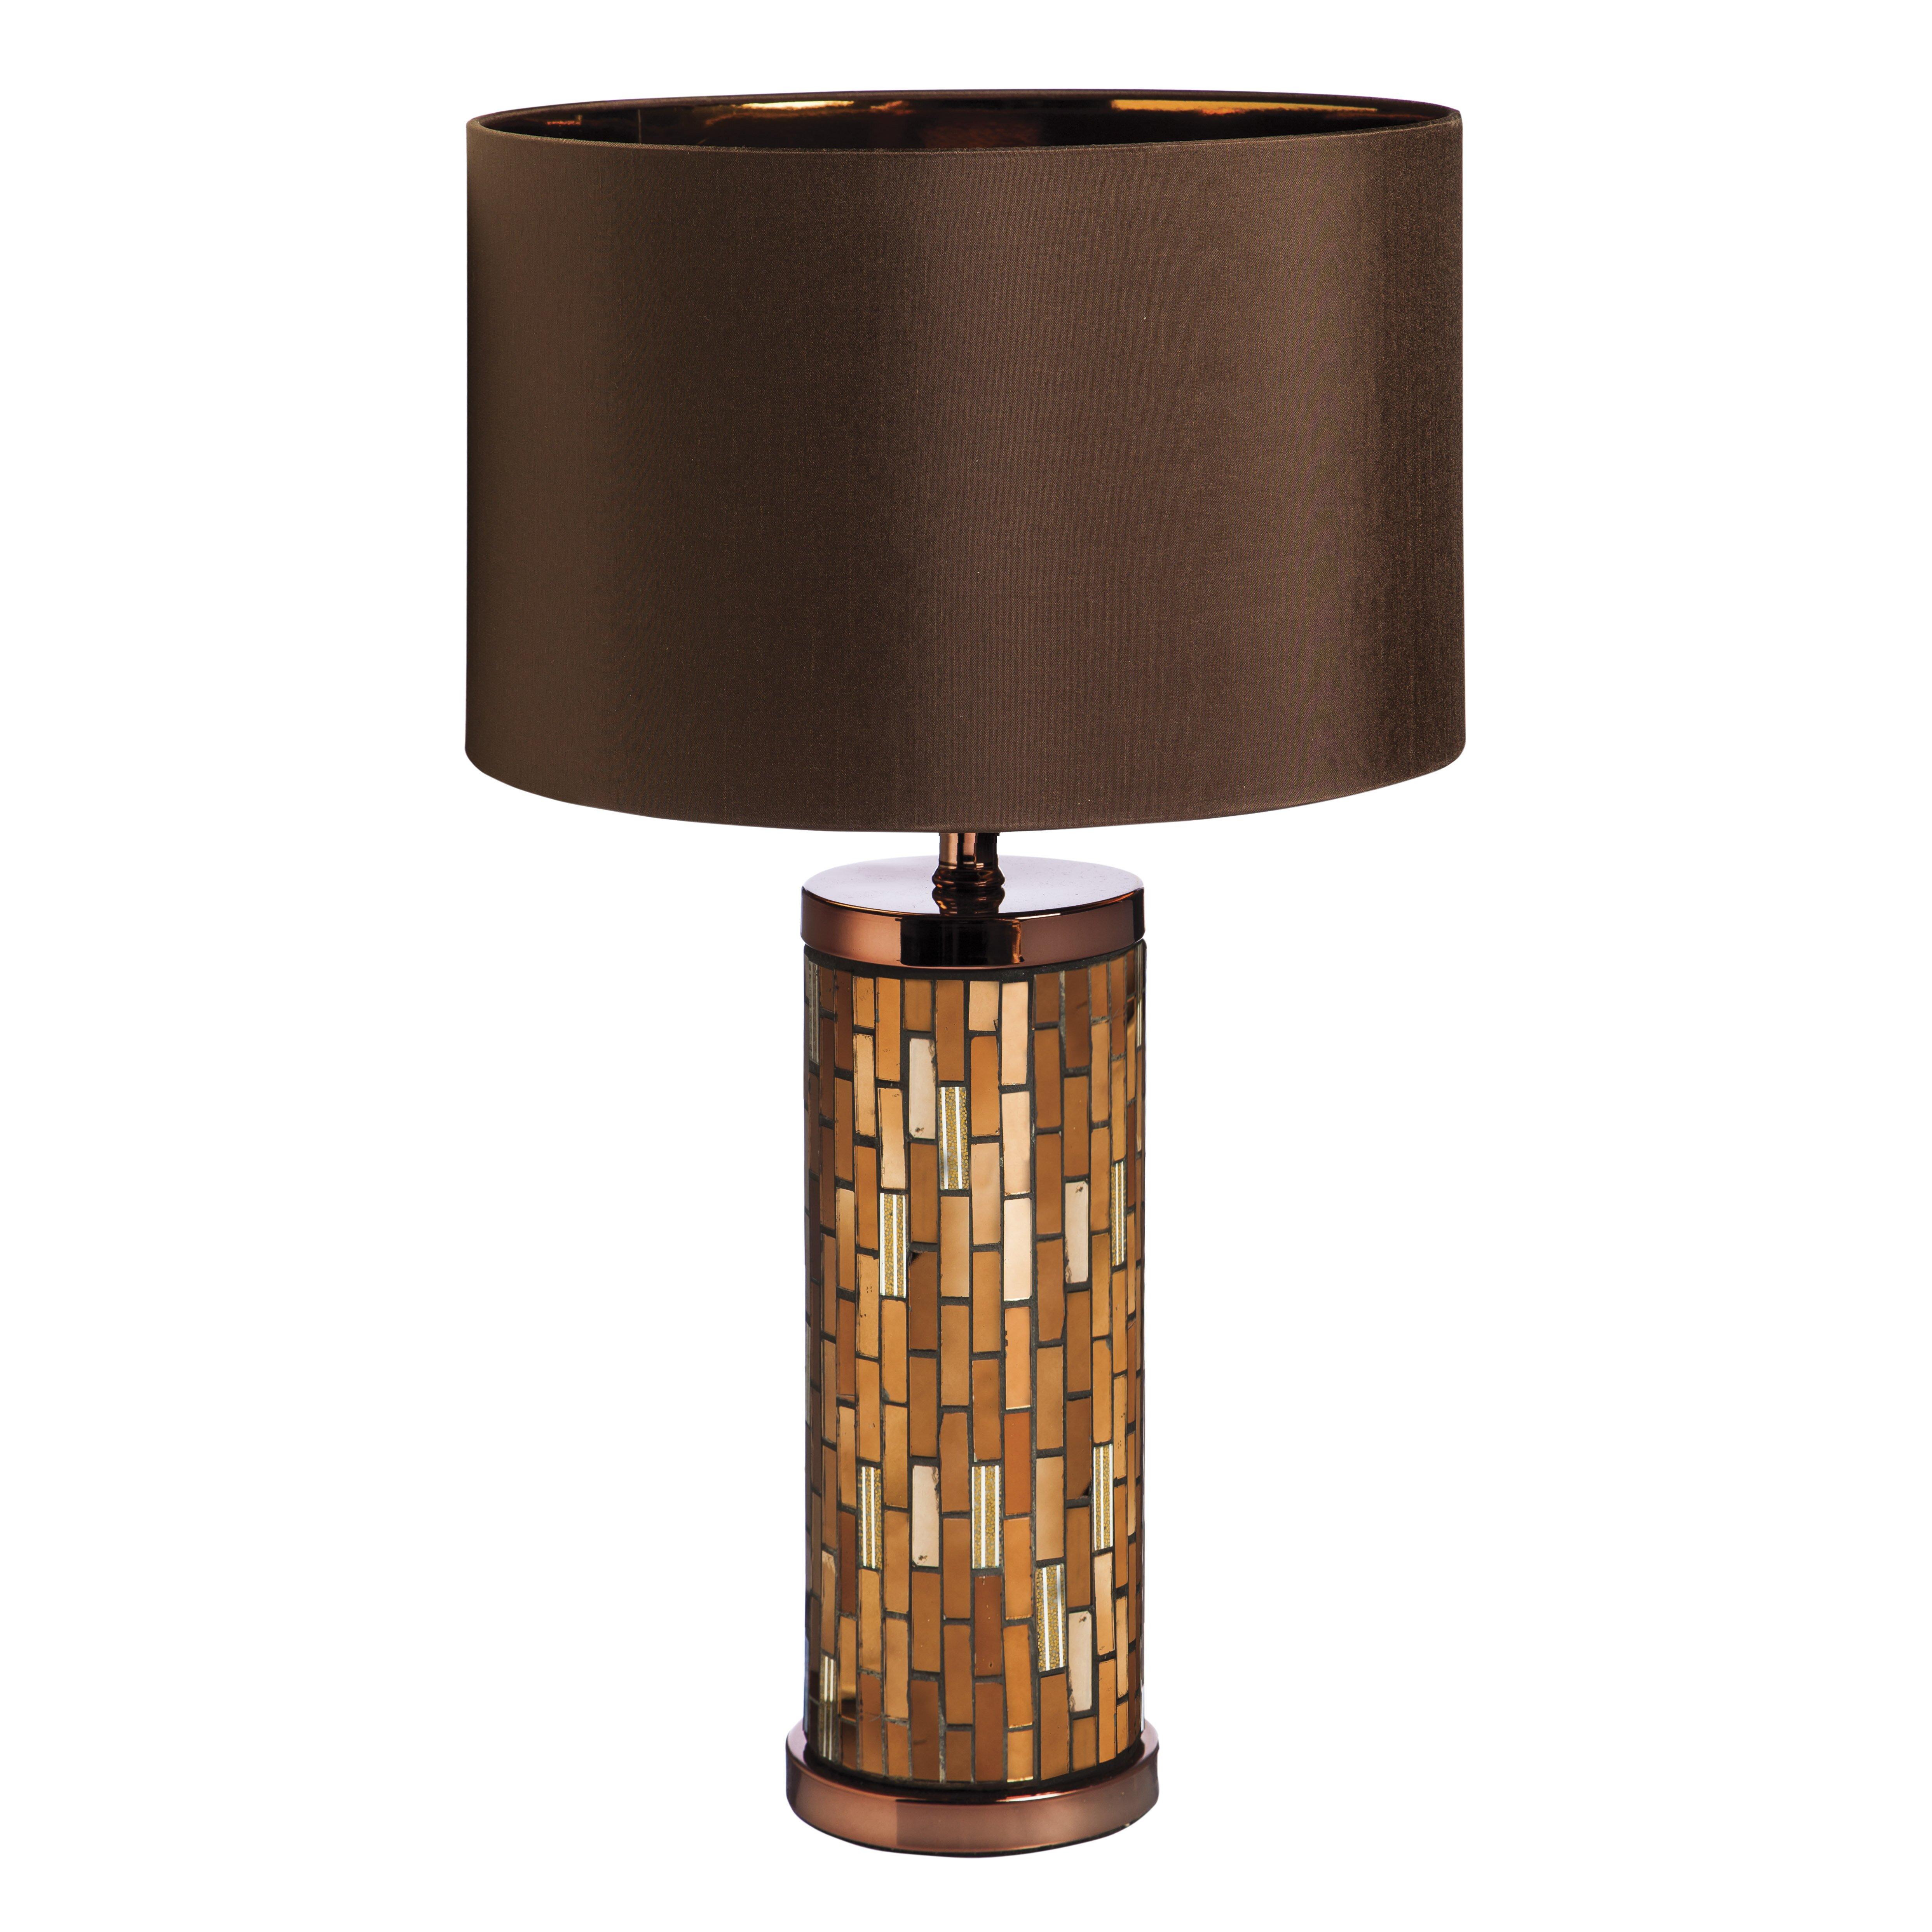 evergreen enterprises inc 24 h table lamp with drum. Black Bedroom Furniture Sets. Home Design Ideas